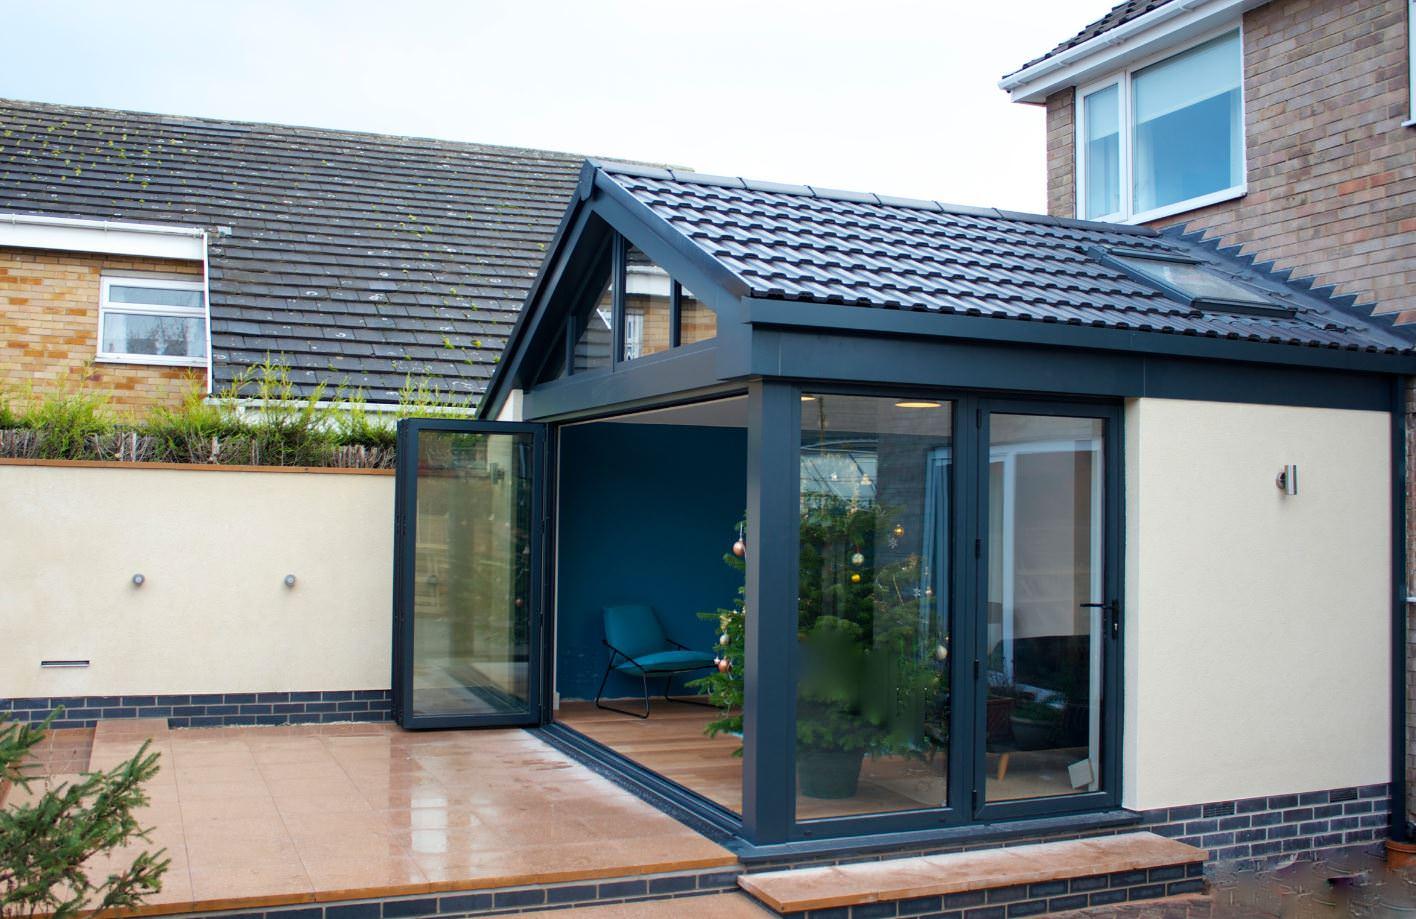 guardian conservatory tiled roofs advanced exterior plastics